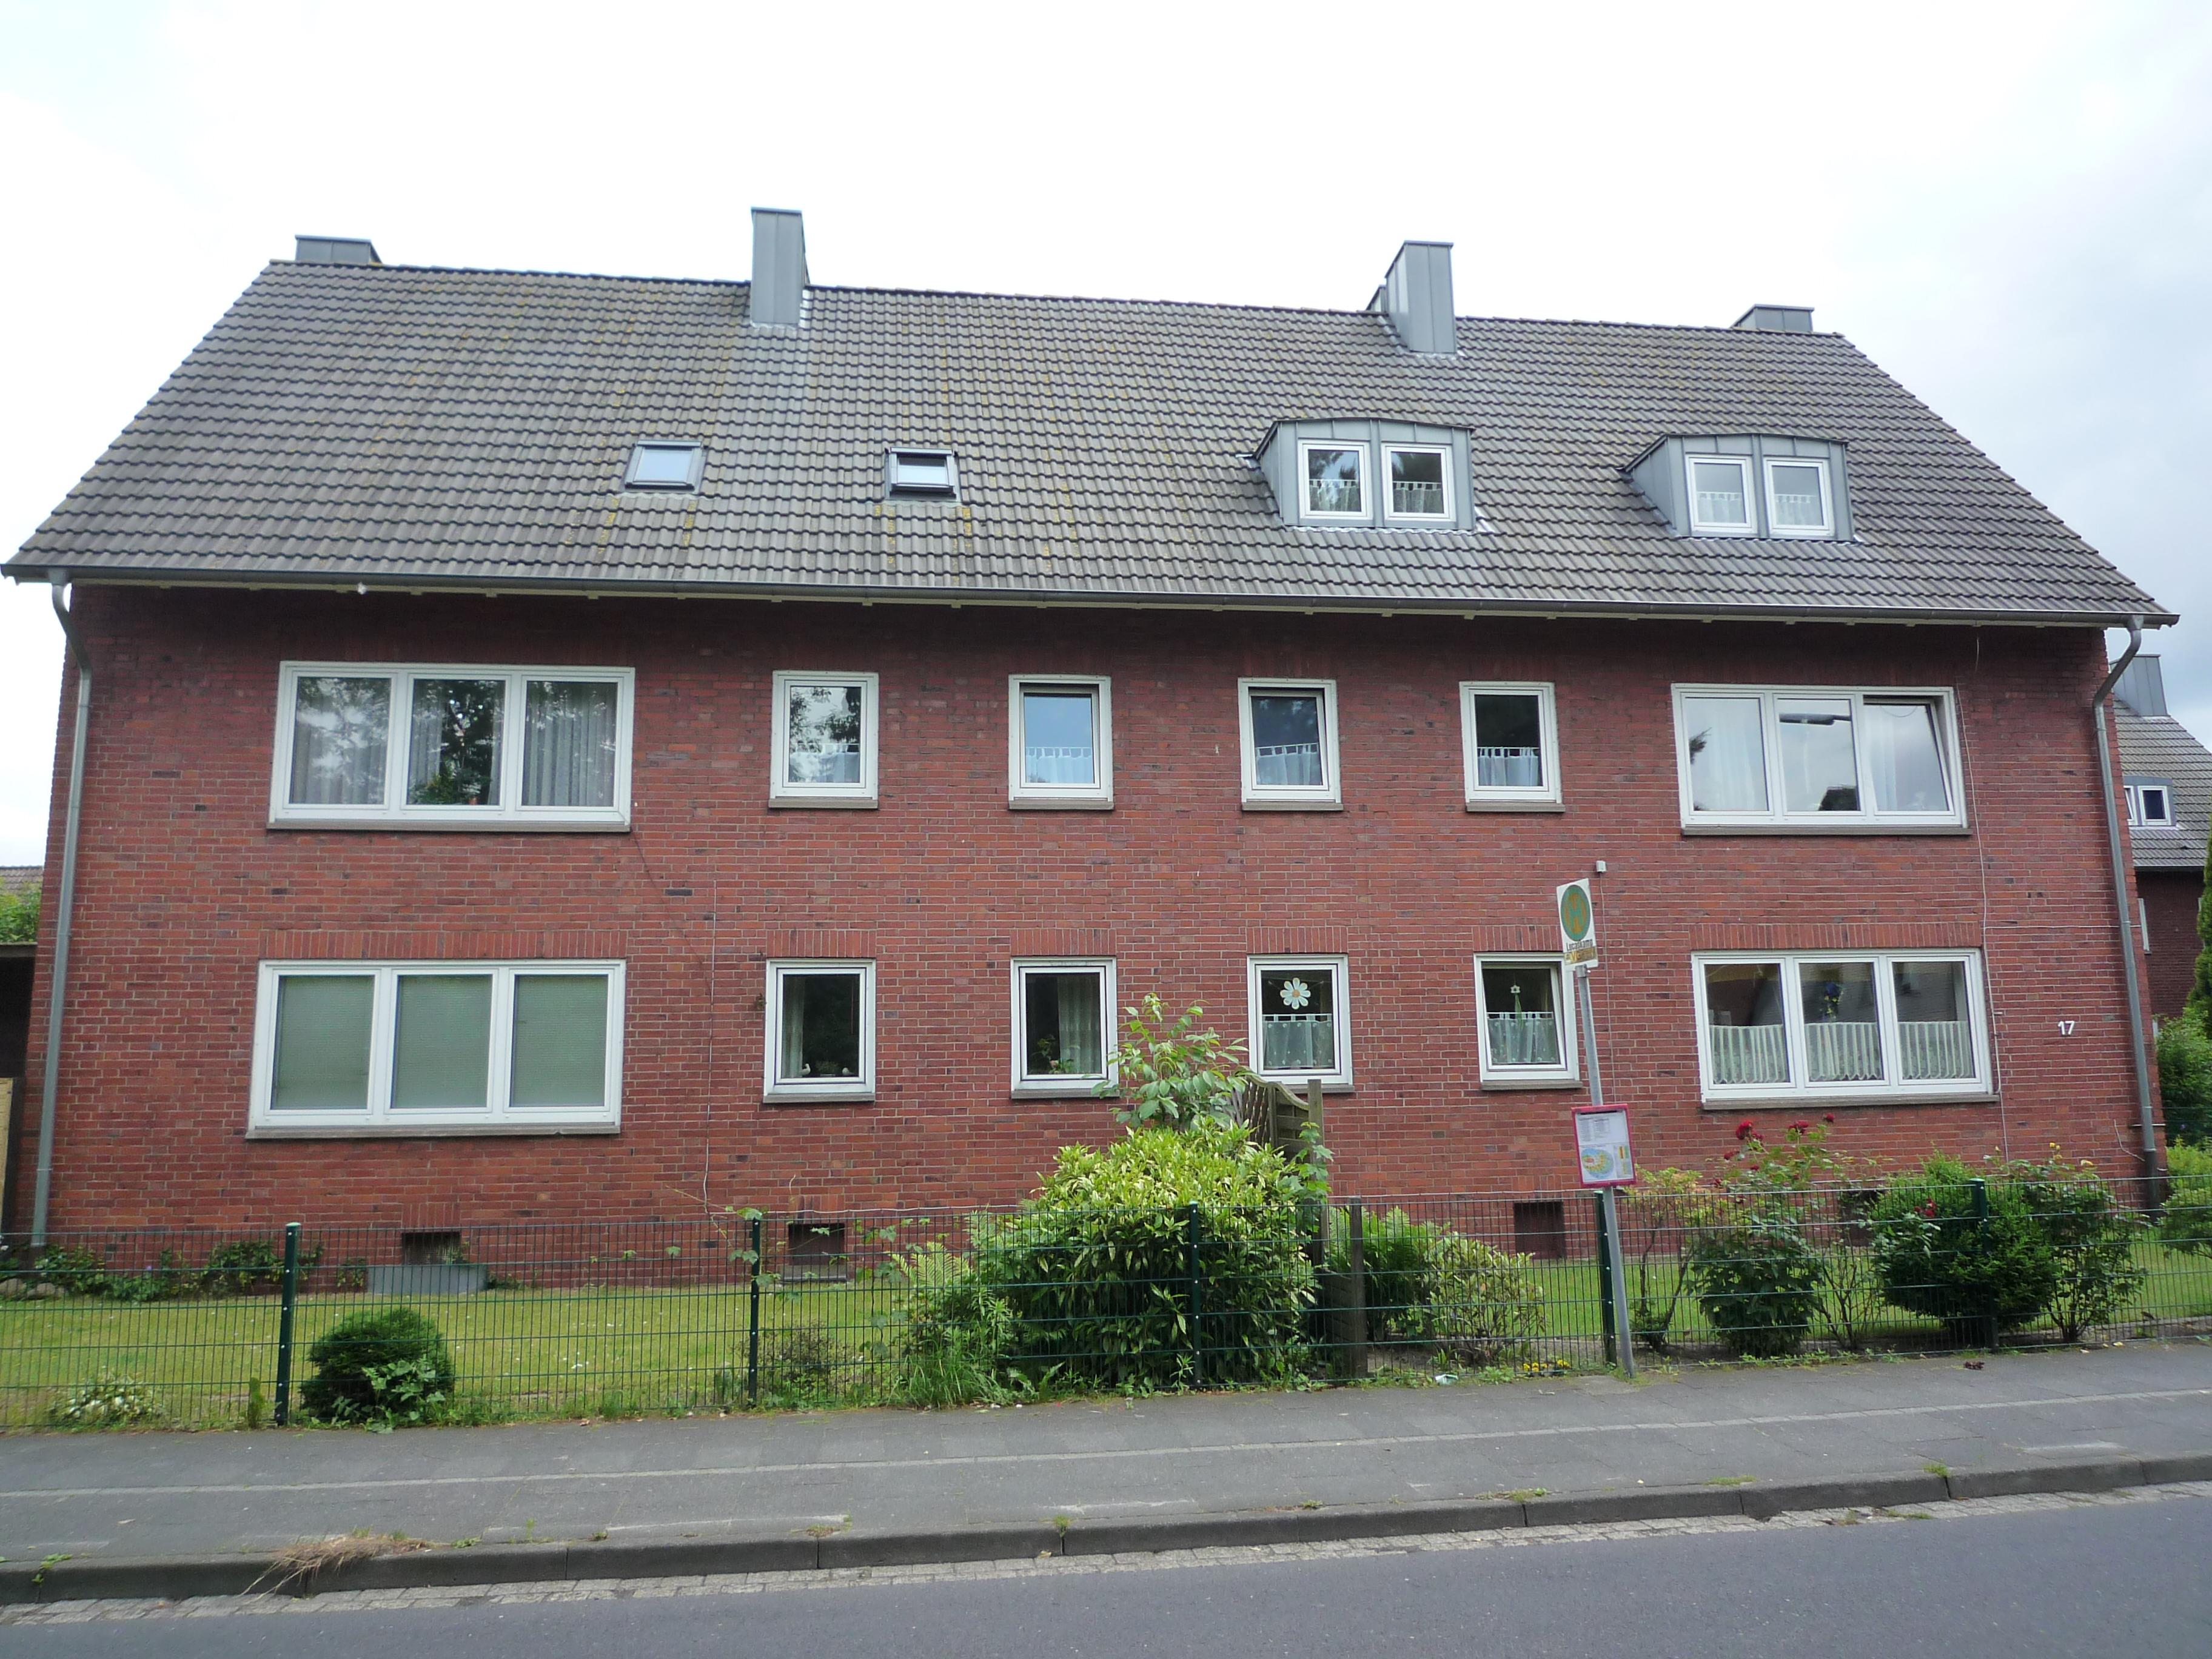 Lingen - Wilhelm-Berning-Straße 17